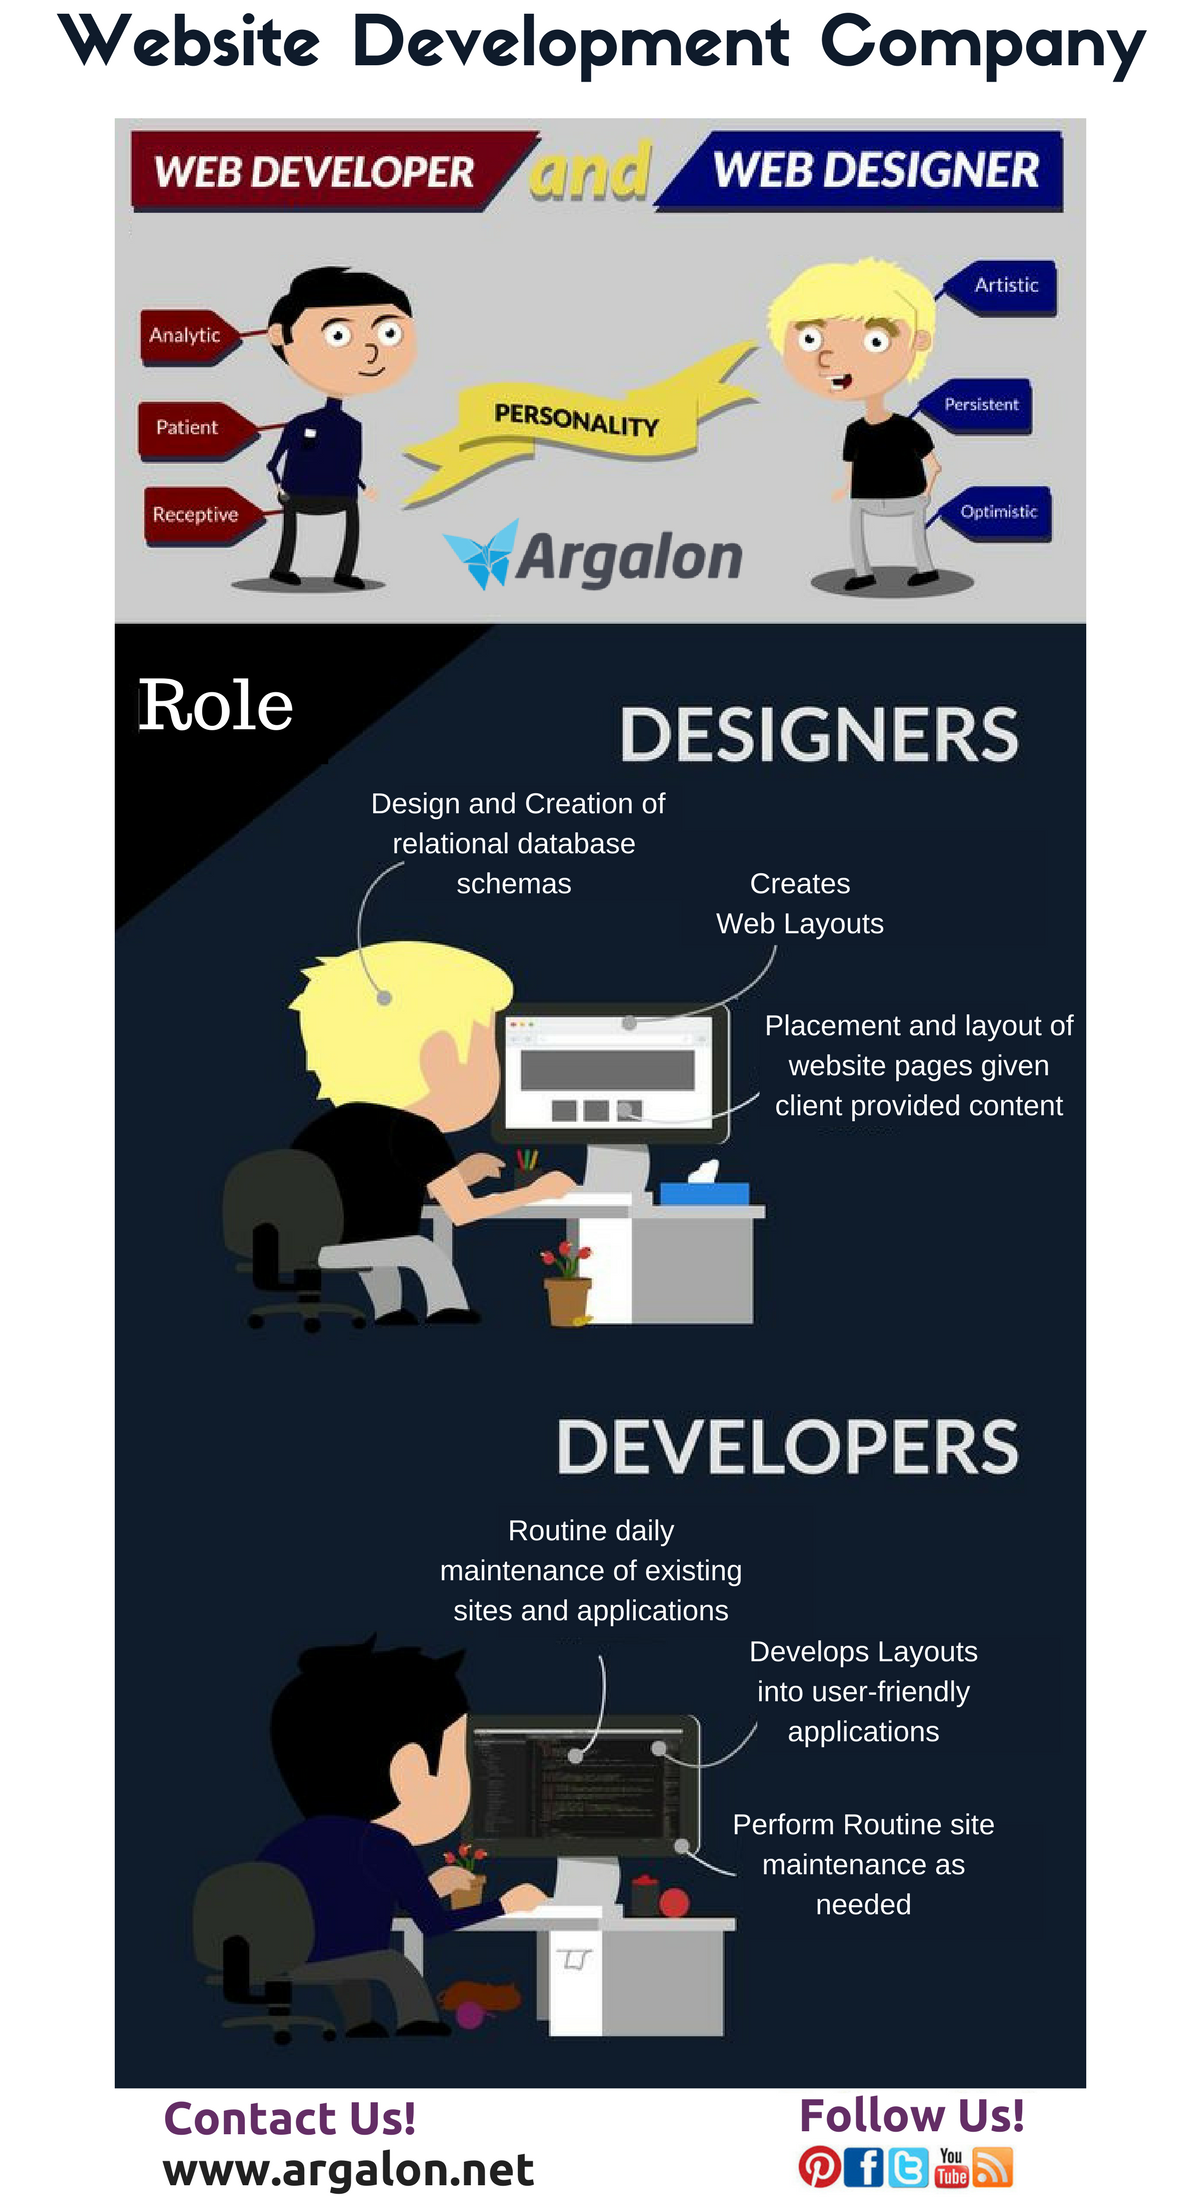 Stupendous Argalon Is A Web Design And Website Development Company Complete Home Design Collection Epsylindsey Bellcom